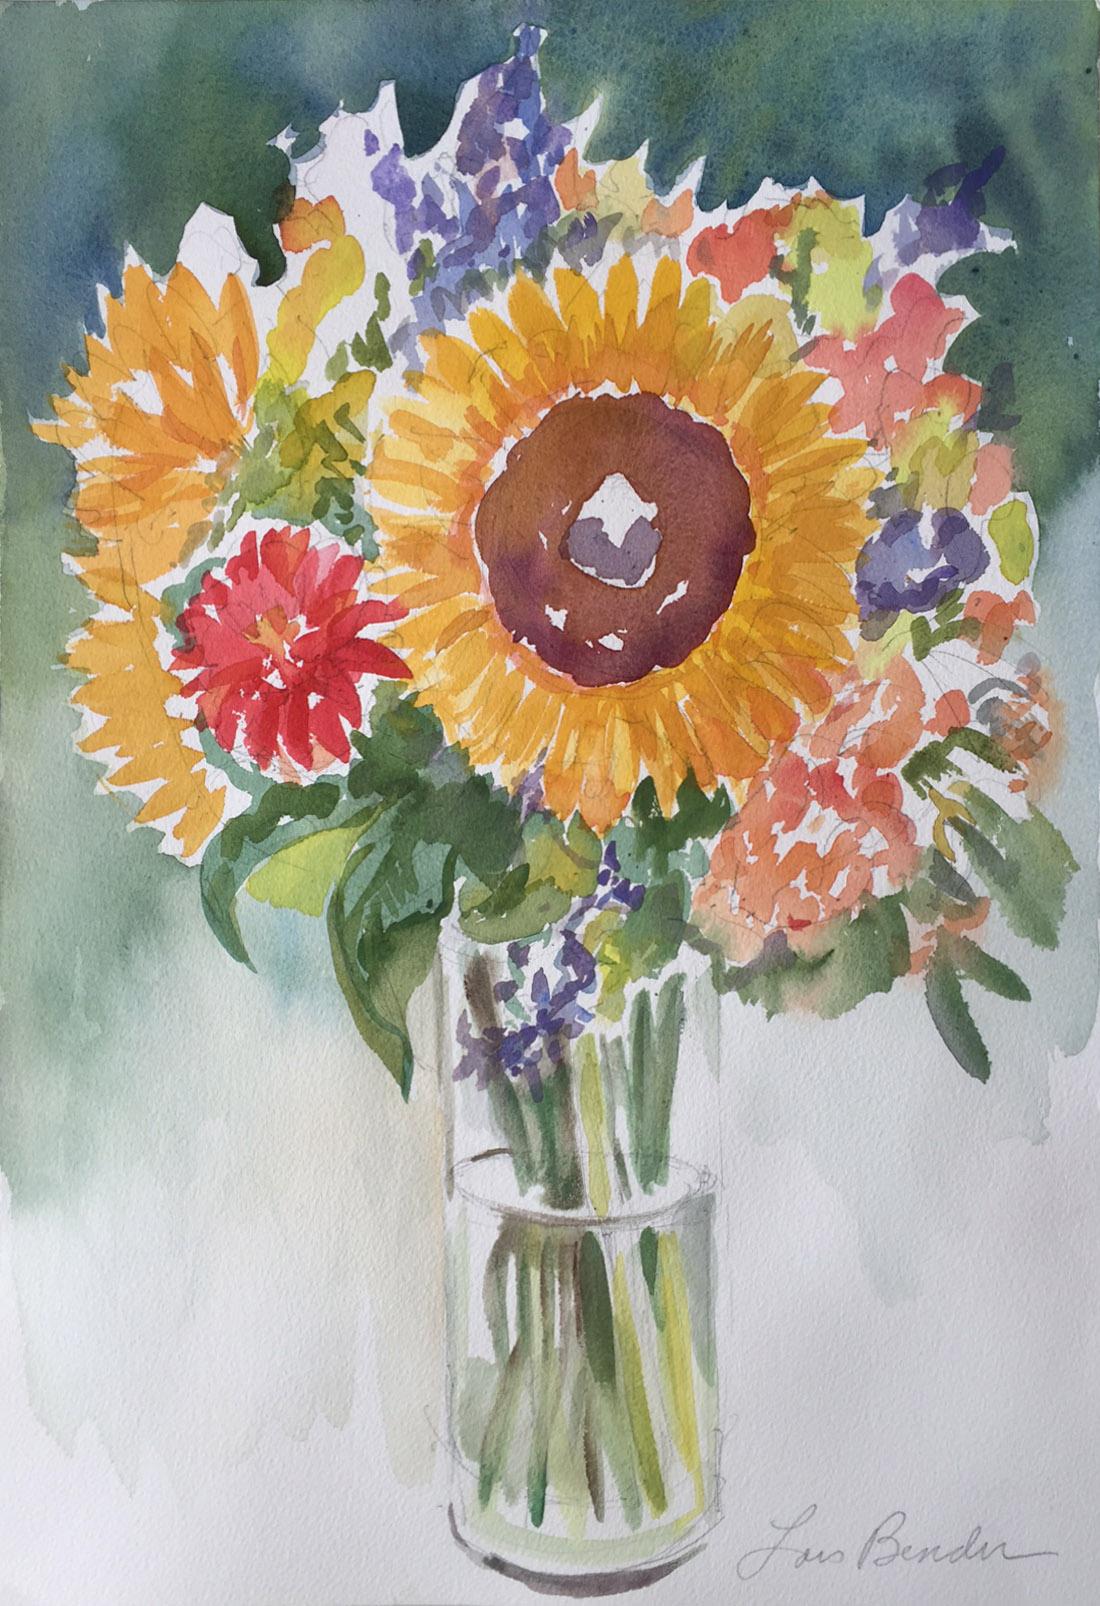 Sunflowers Bouquet III